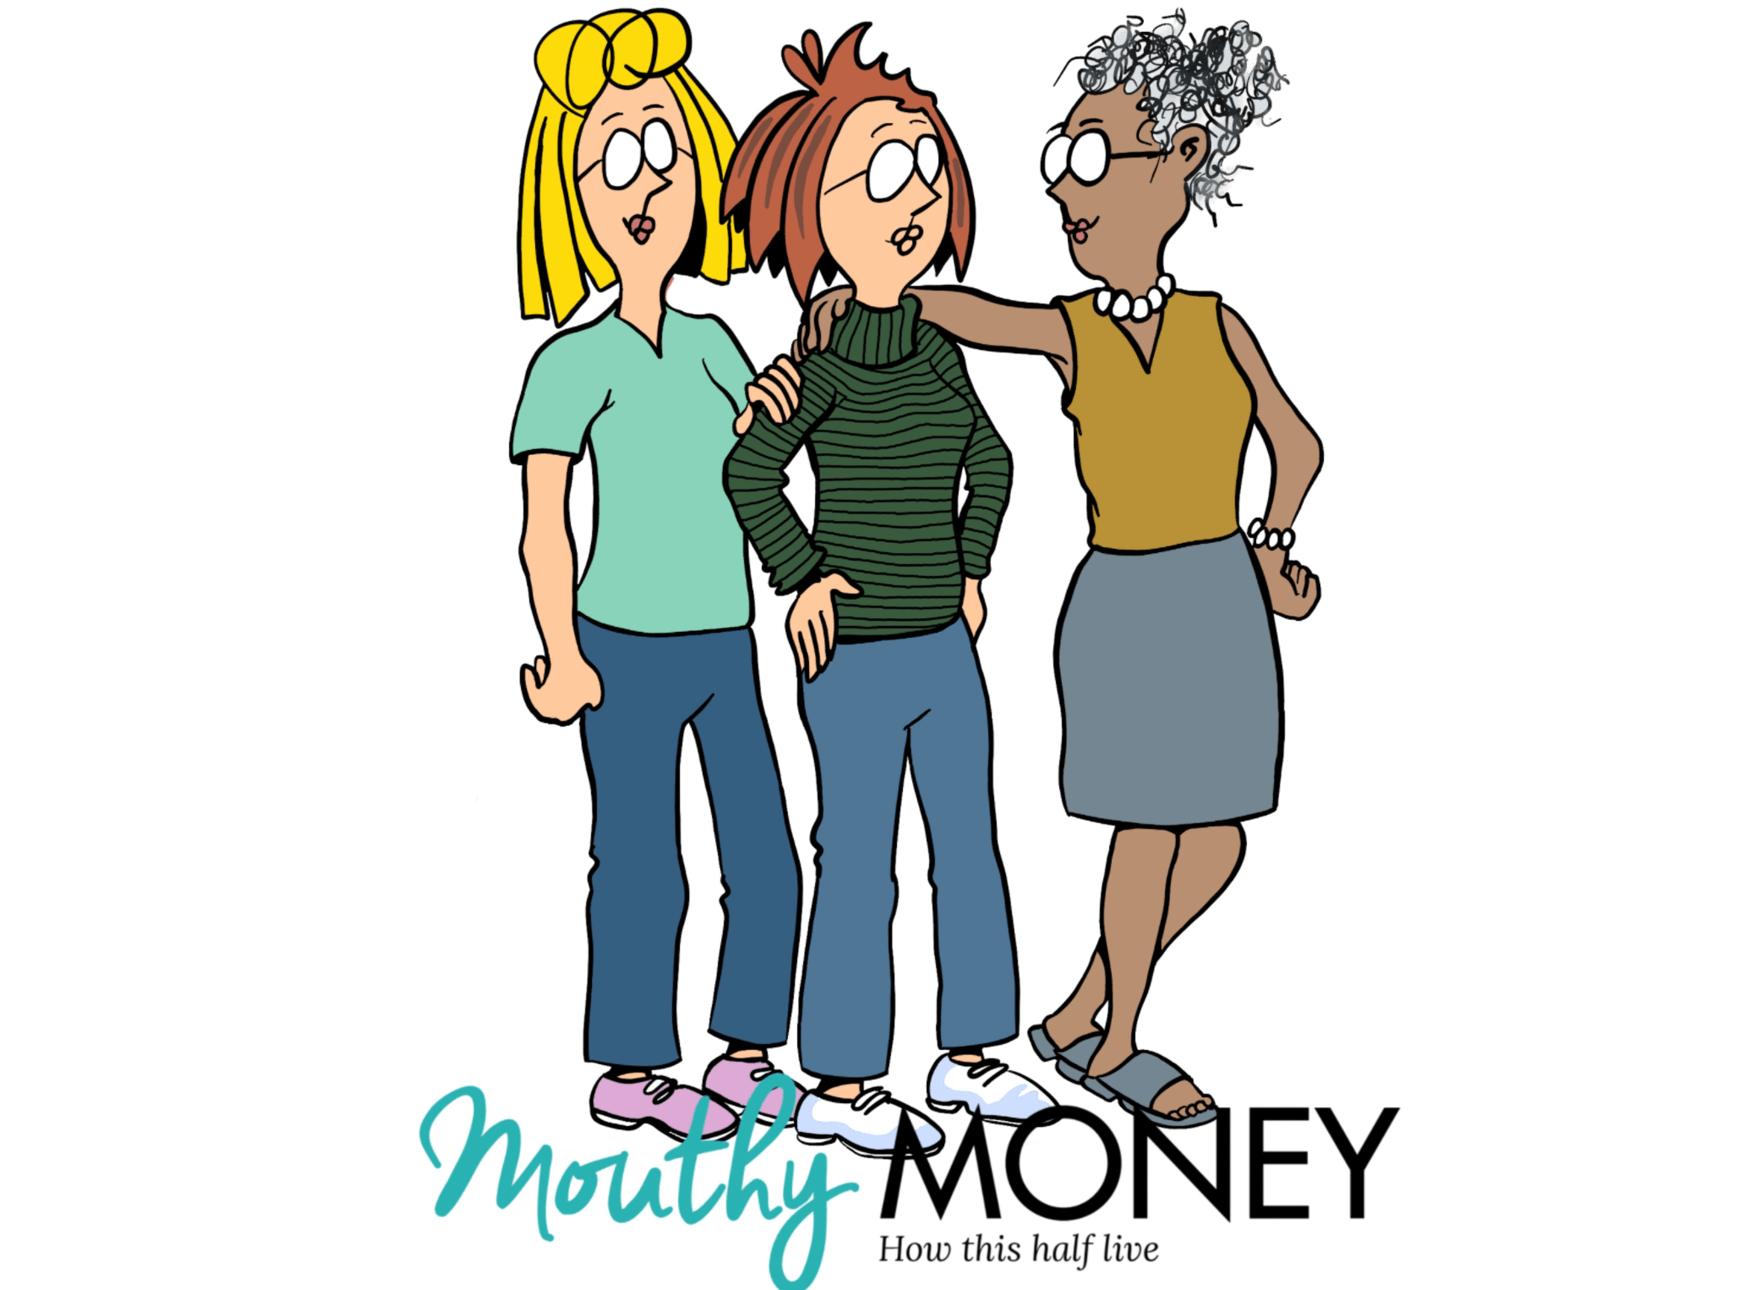 Mouthy Money